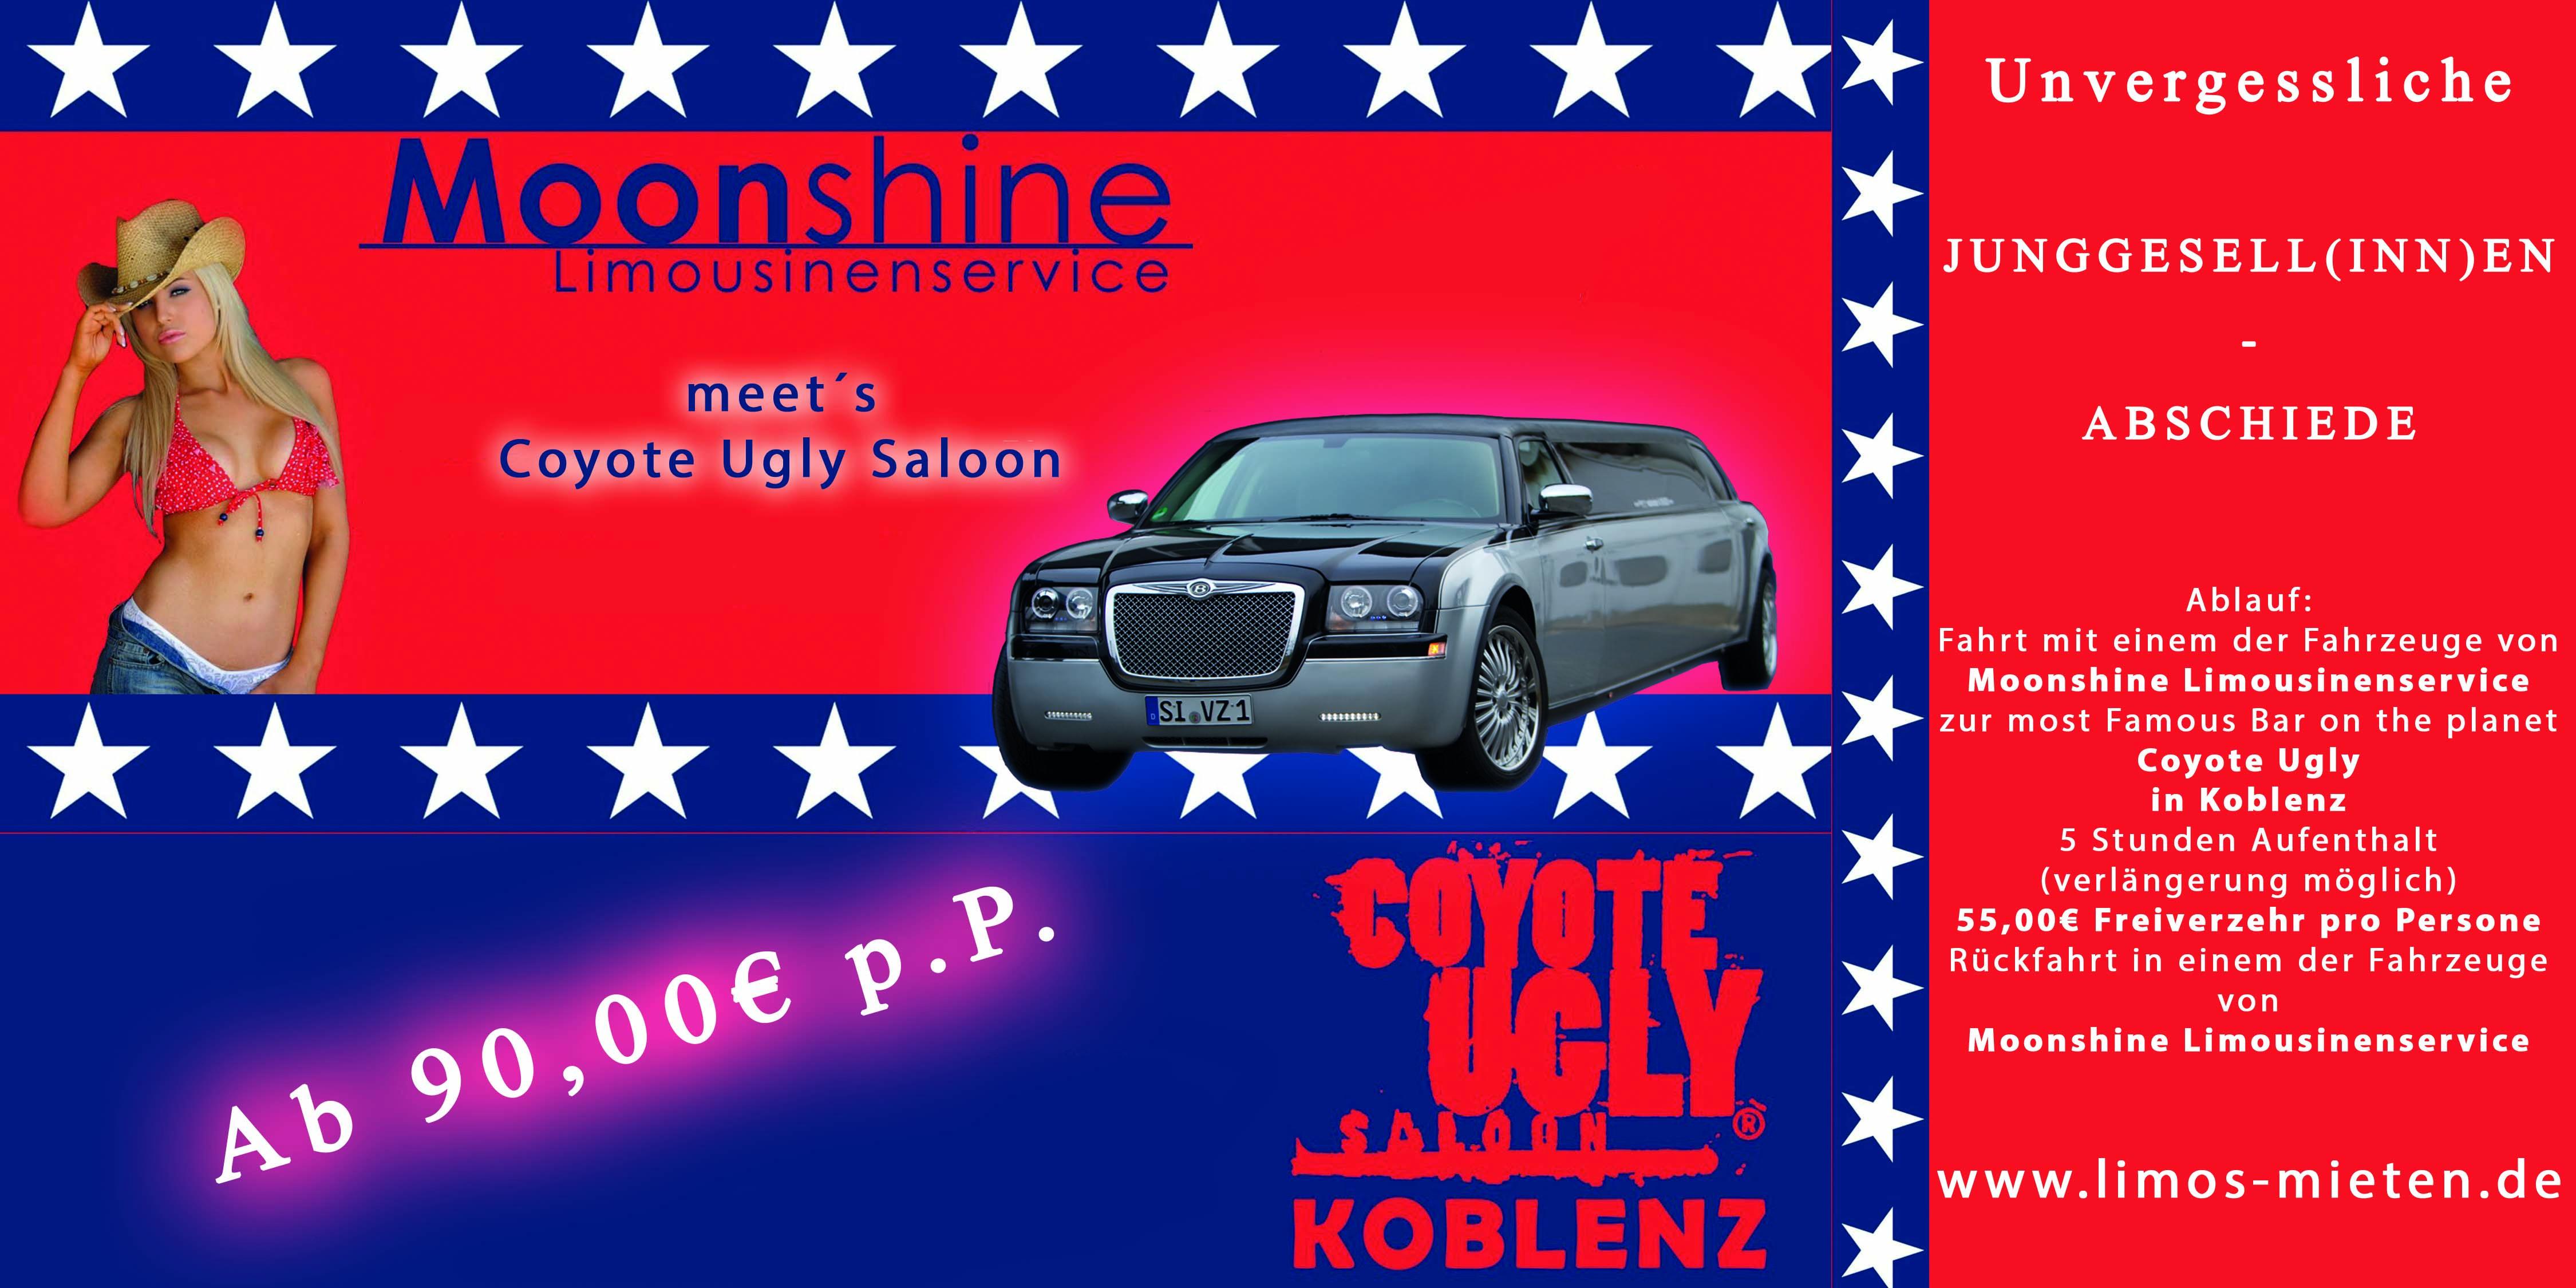 Partybus und Stretchlimousine zur Coyote Ugly Bar in Koblenz